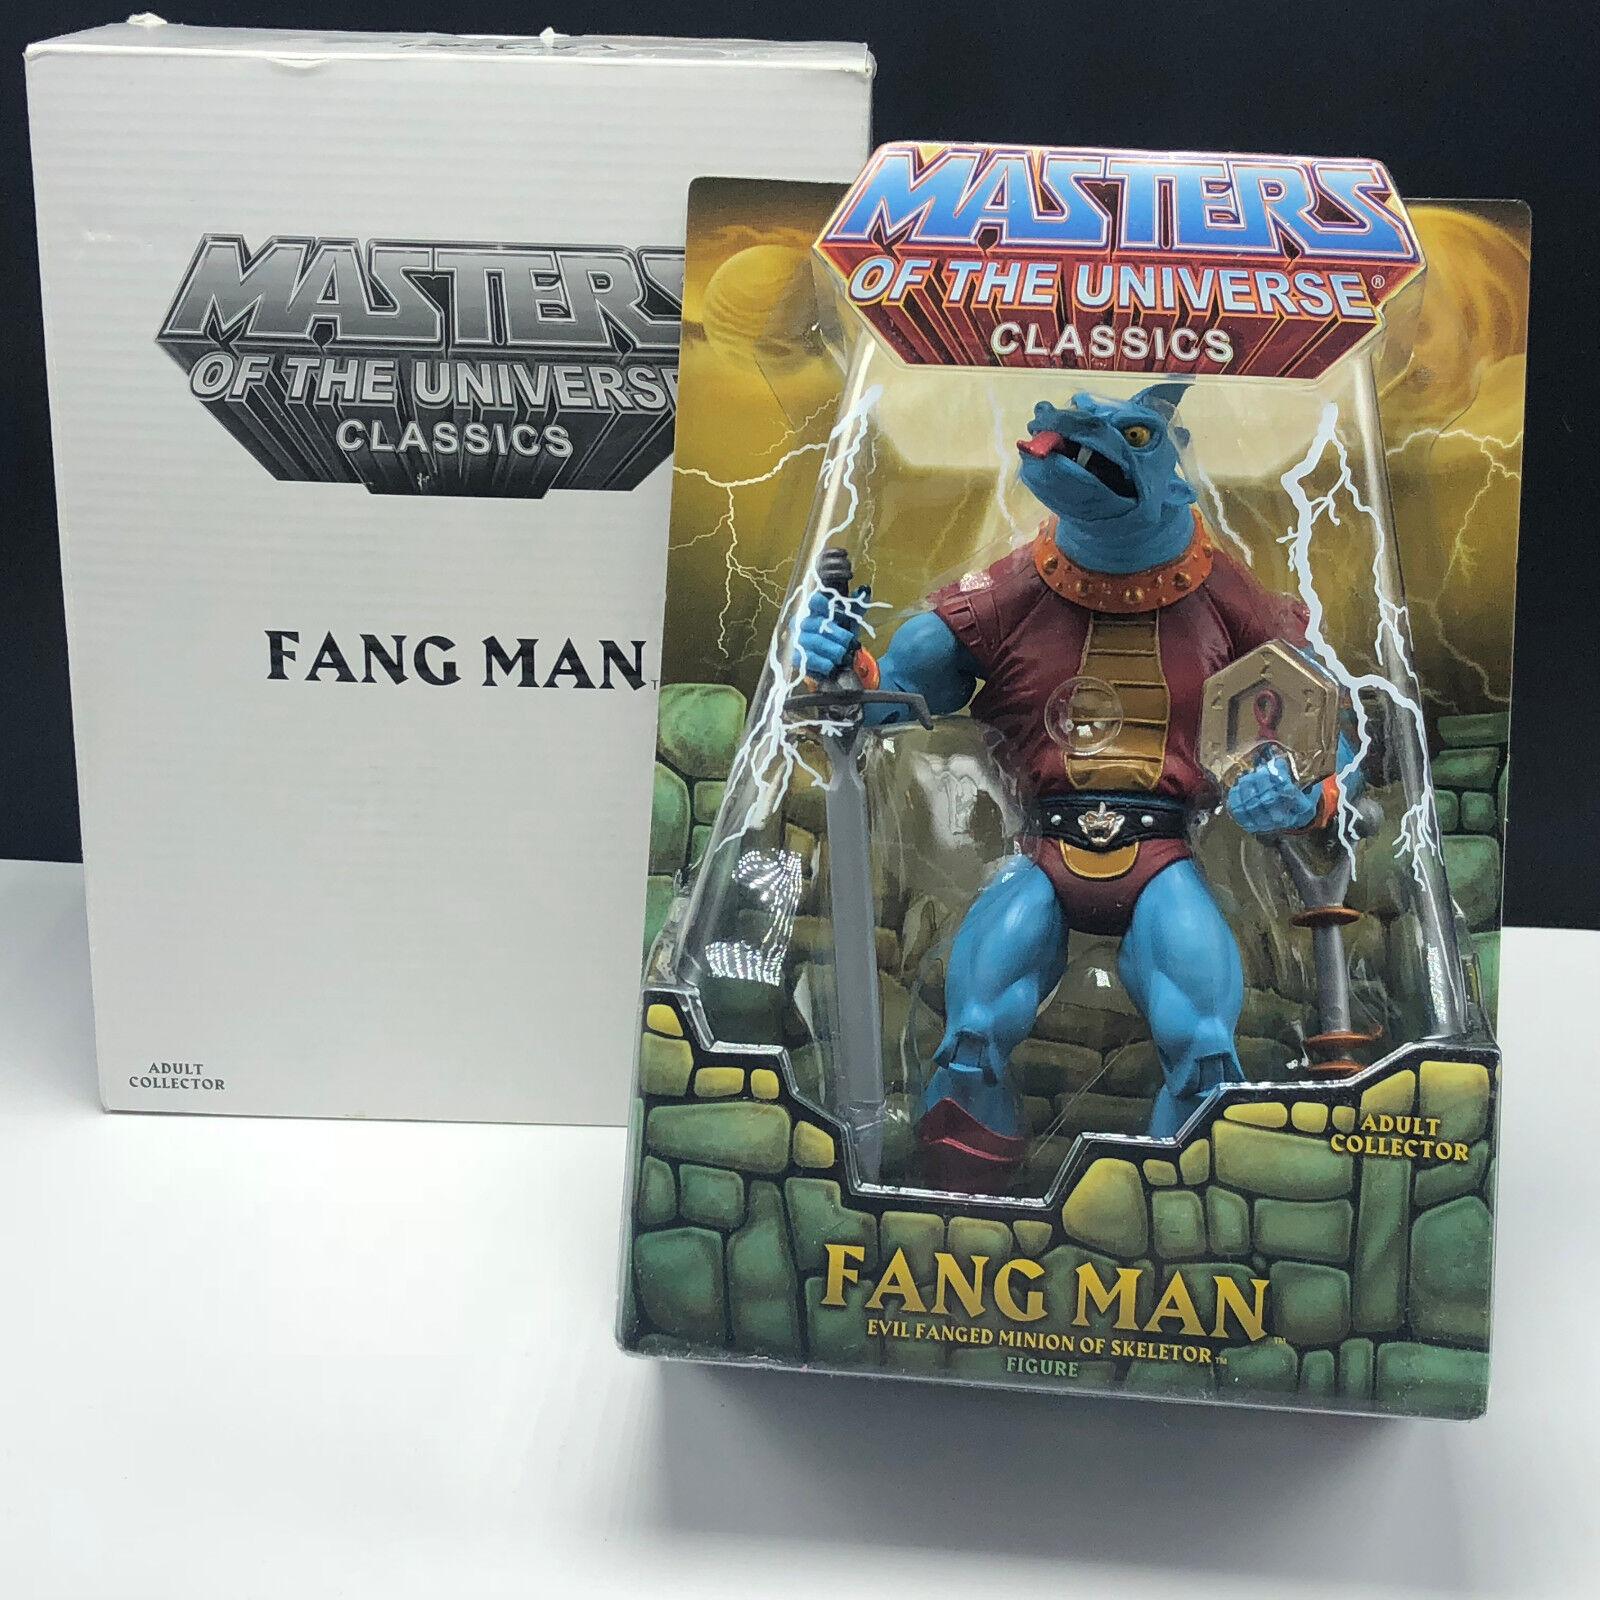 MASTERS OF UNIVERSE He-Man classics matty action figure moc mattel Fang Man box